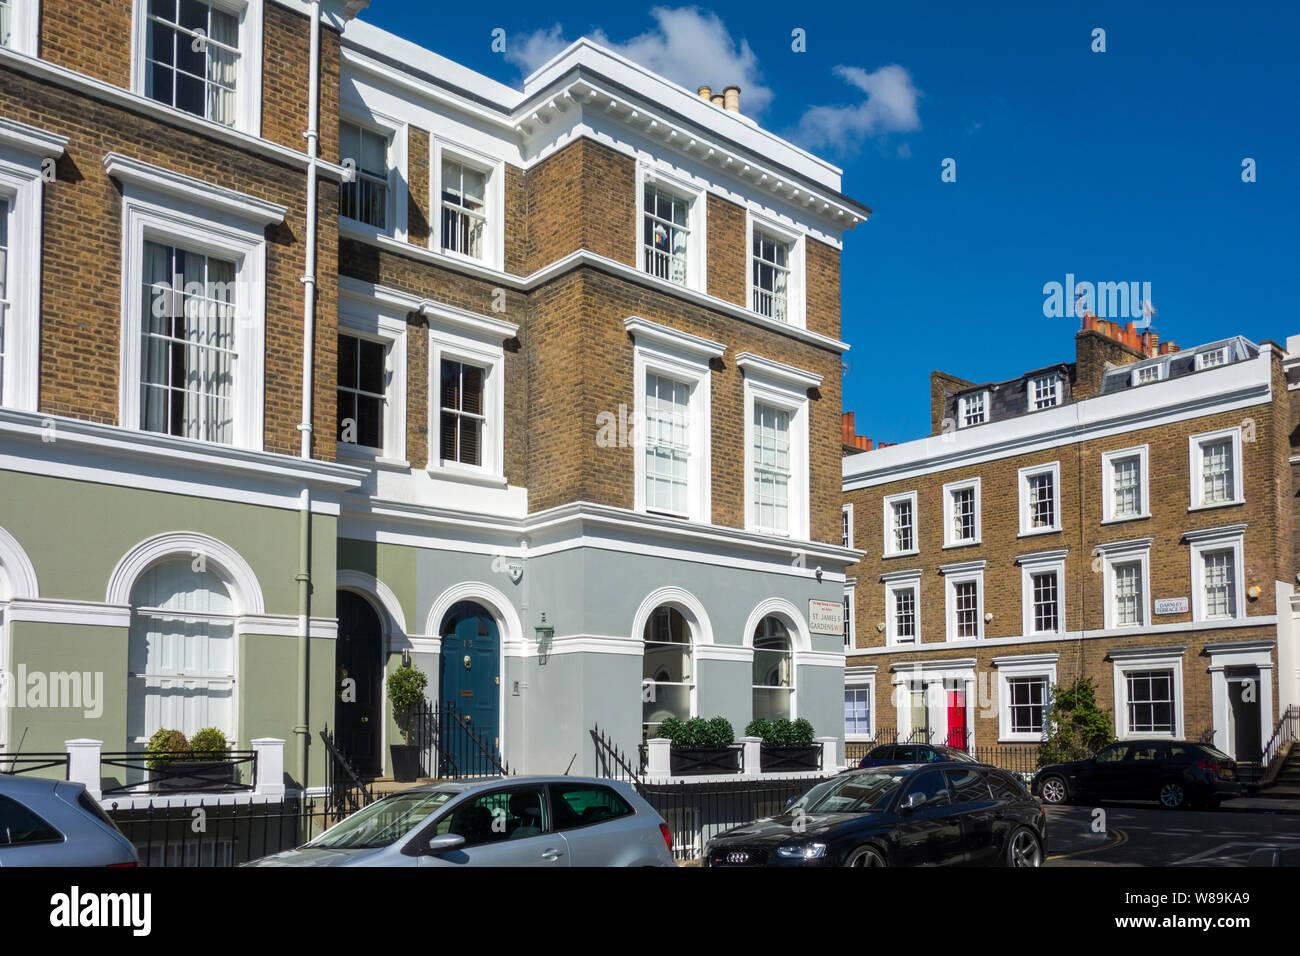 Terraced houses on St. James's Gardens, The Royal Borough of Kensington and Chelsea, Notting Hill, London, UK Stock Photo